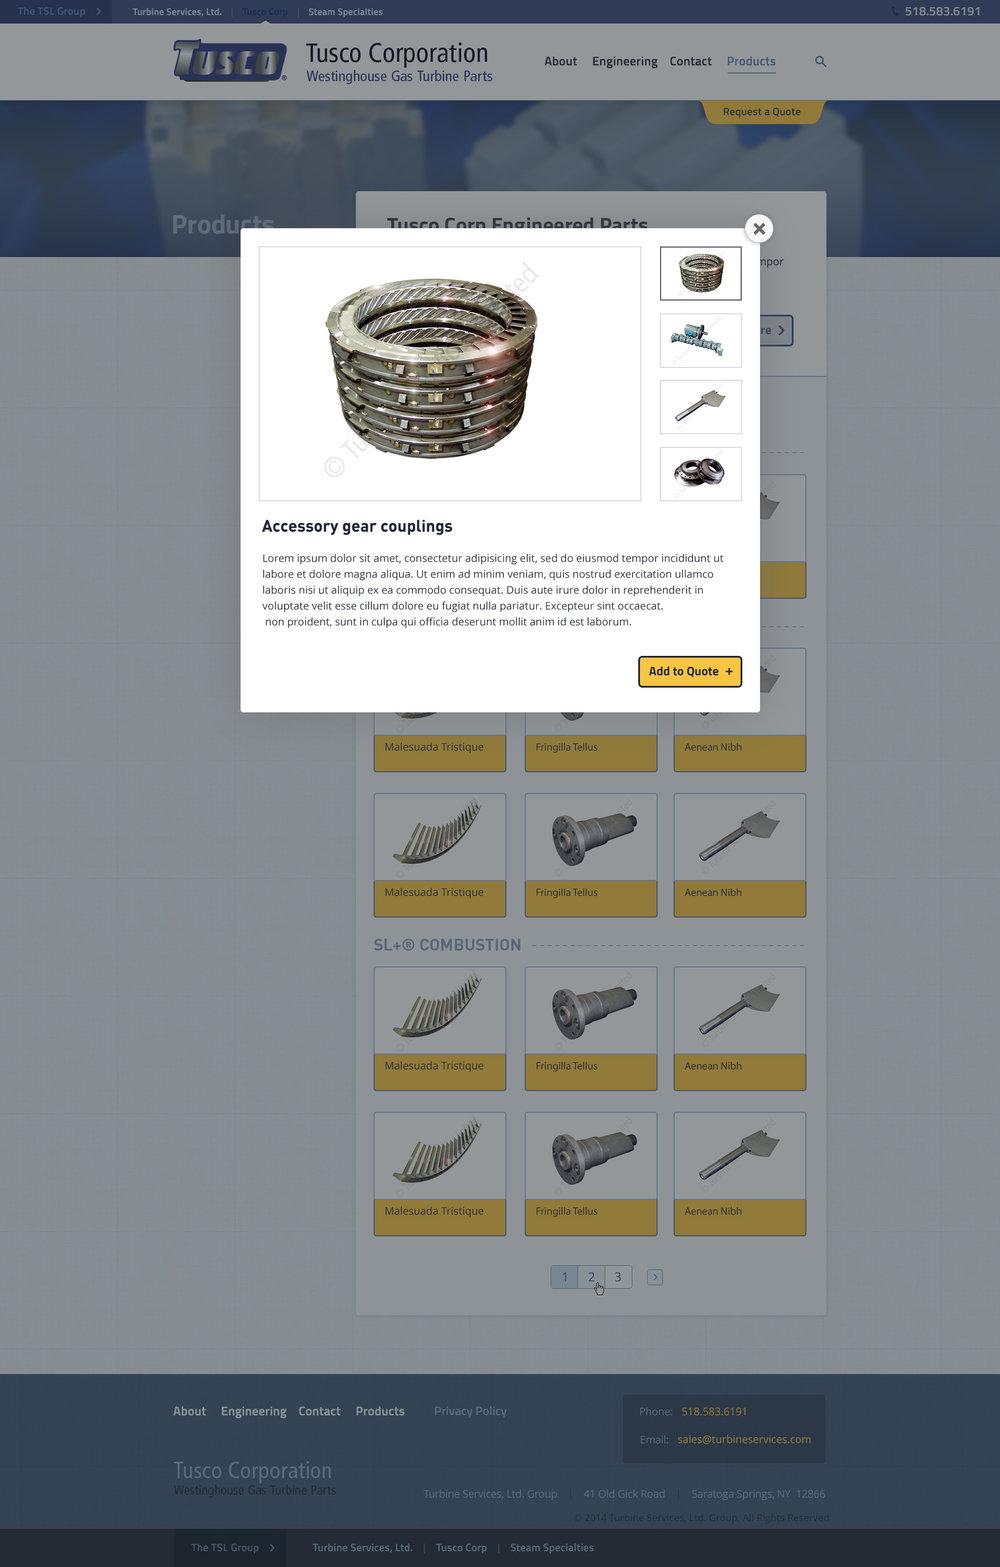 """Tusco Corp"" sub-site, parts page"